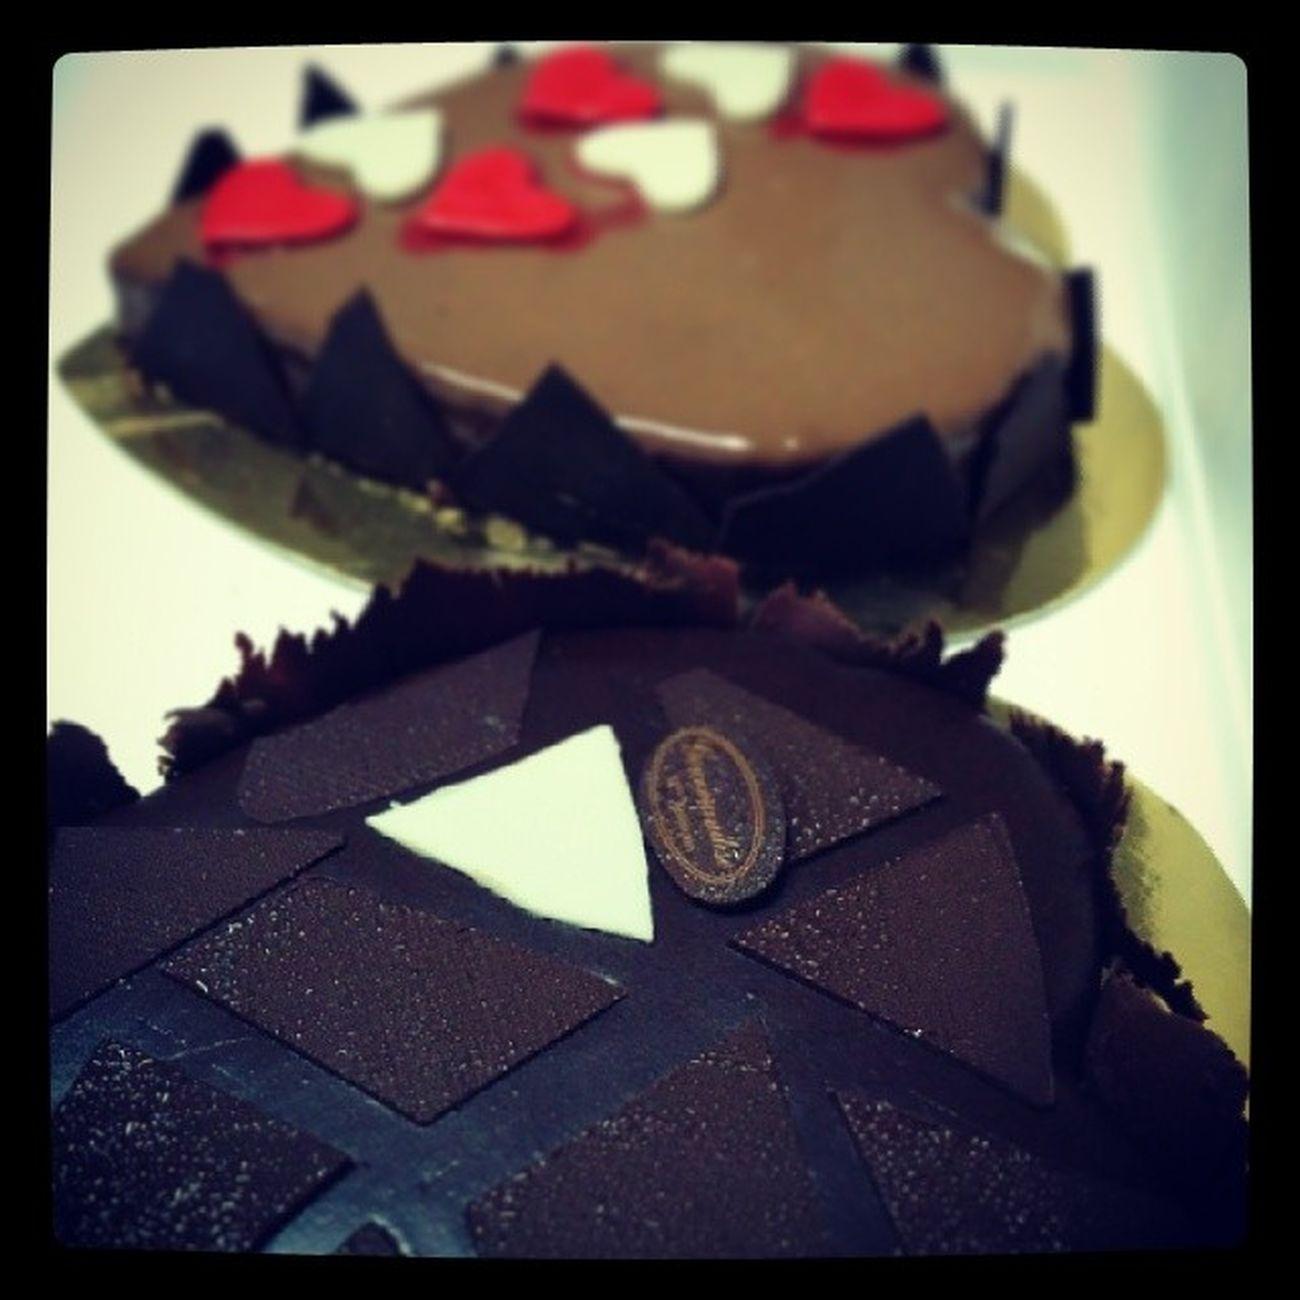 Barcha 7ob *_* SV Loveit Love 7ob klab en gourmandise cake xo